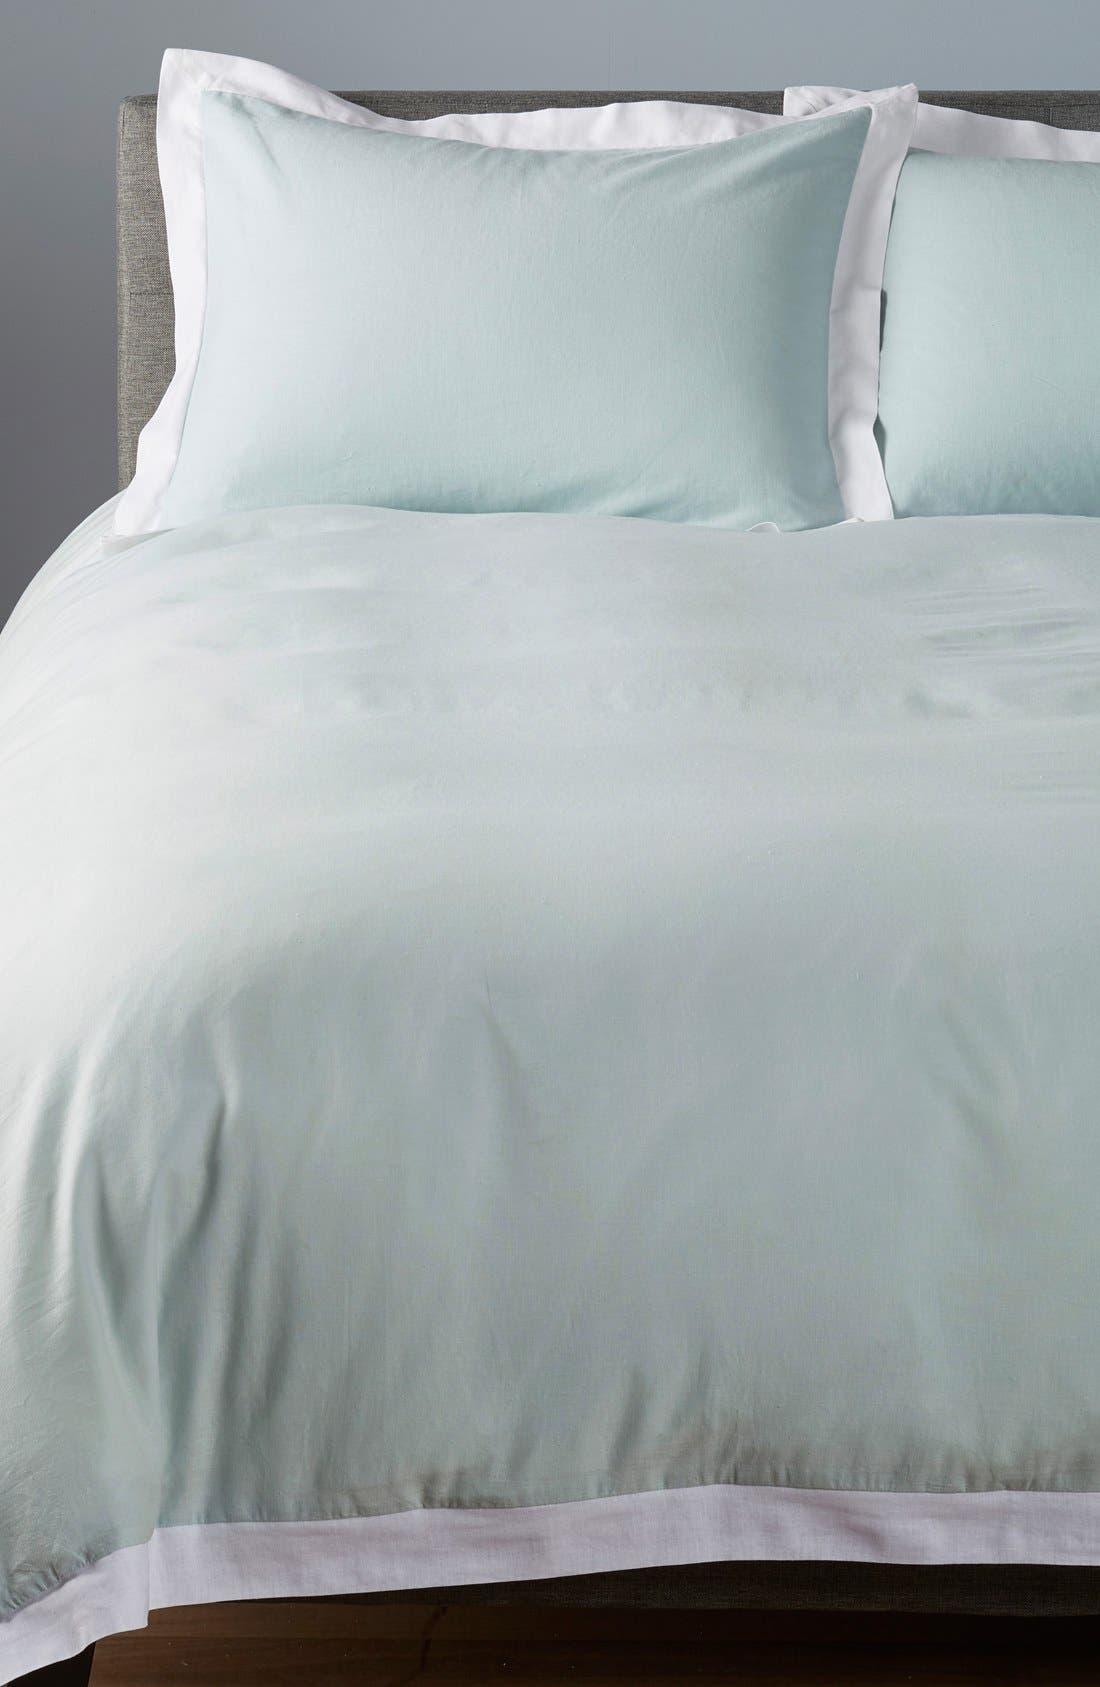 'Spa' Washed Linen Duvet Cover,                         Main,                         color, 400